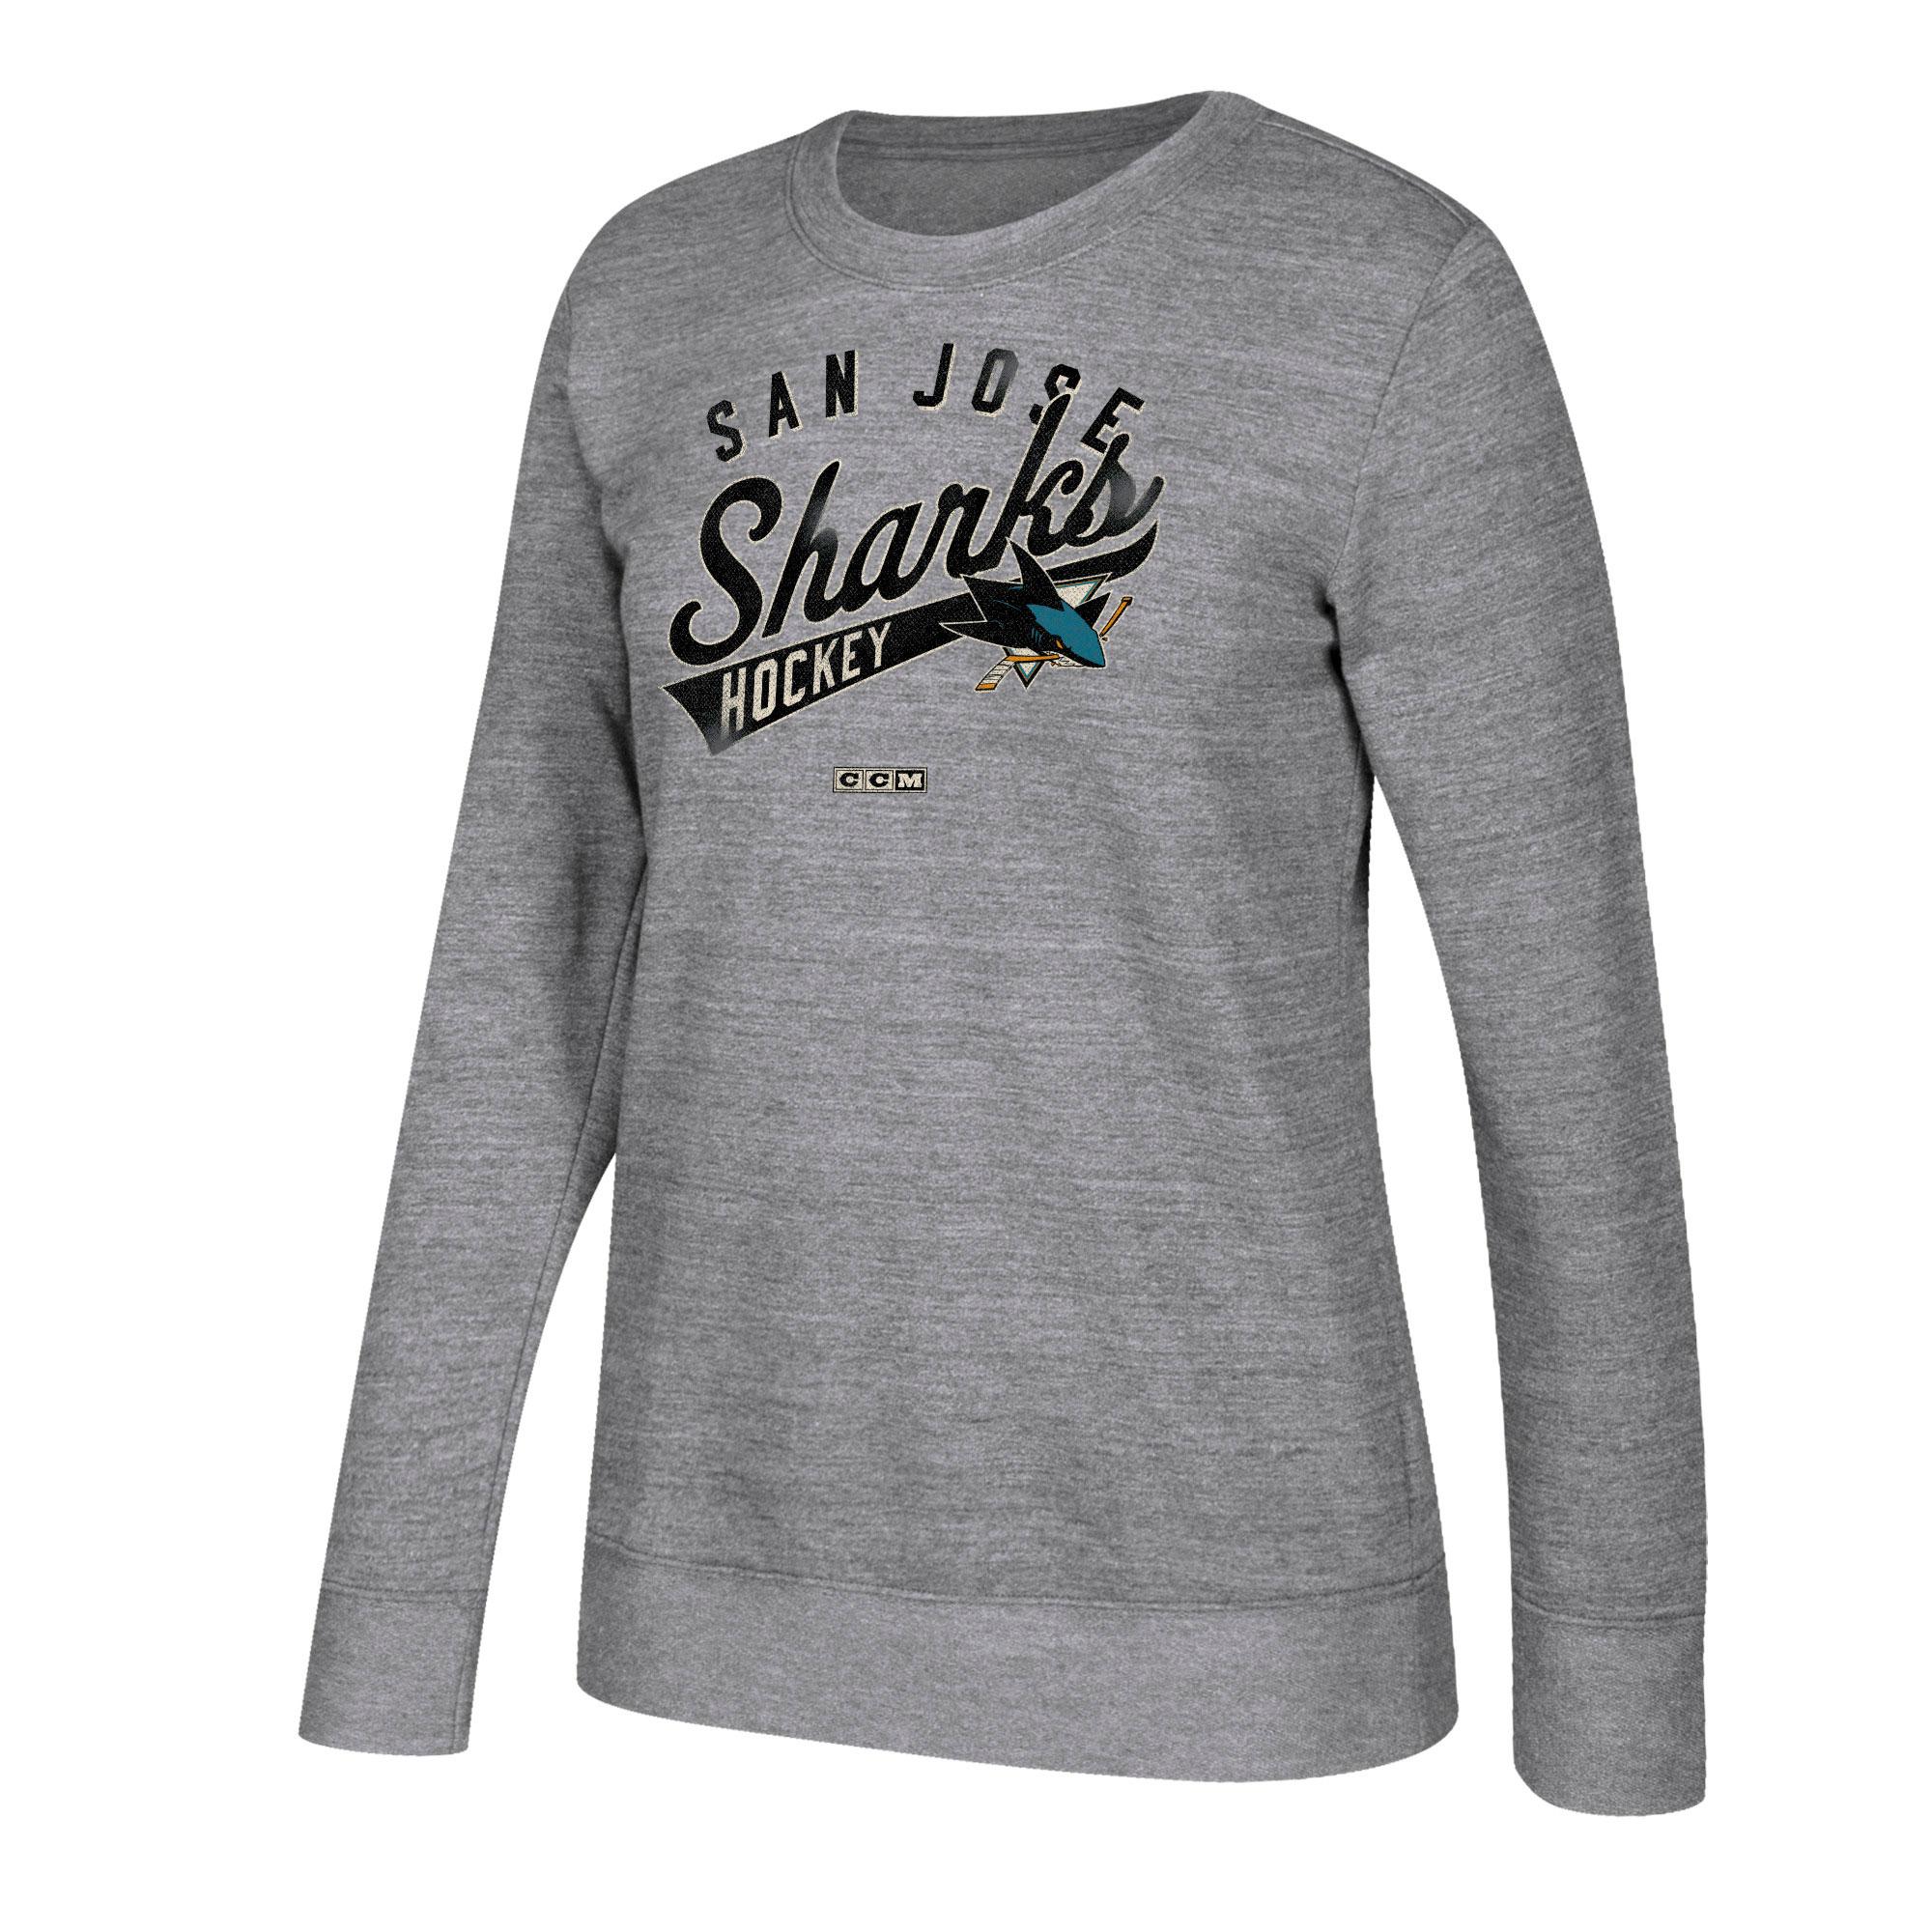 a15c6151cb39 CCM San Jose Sharks tričko s dlhým rukávom dámske